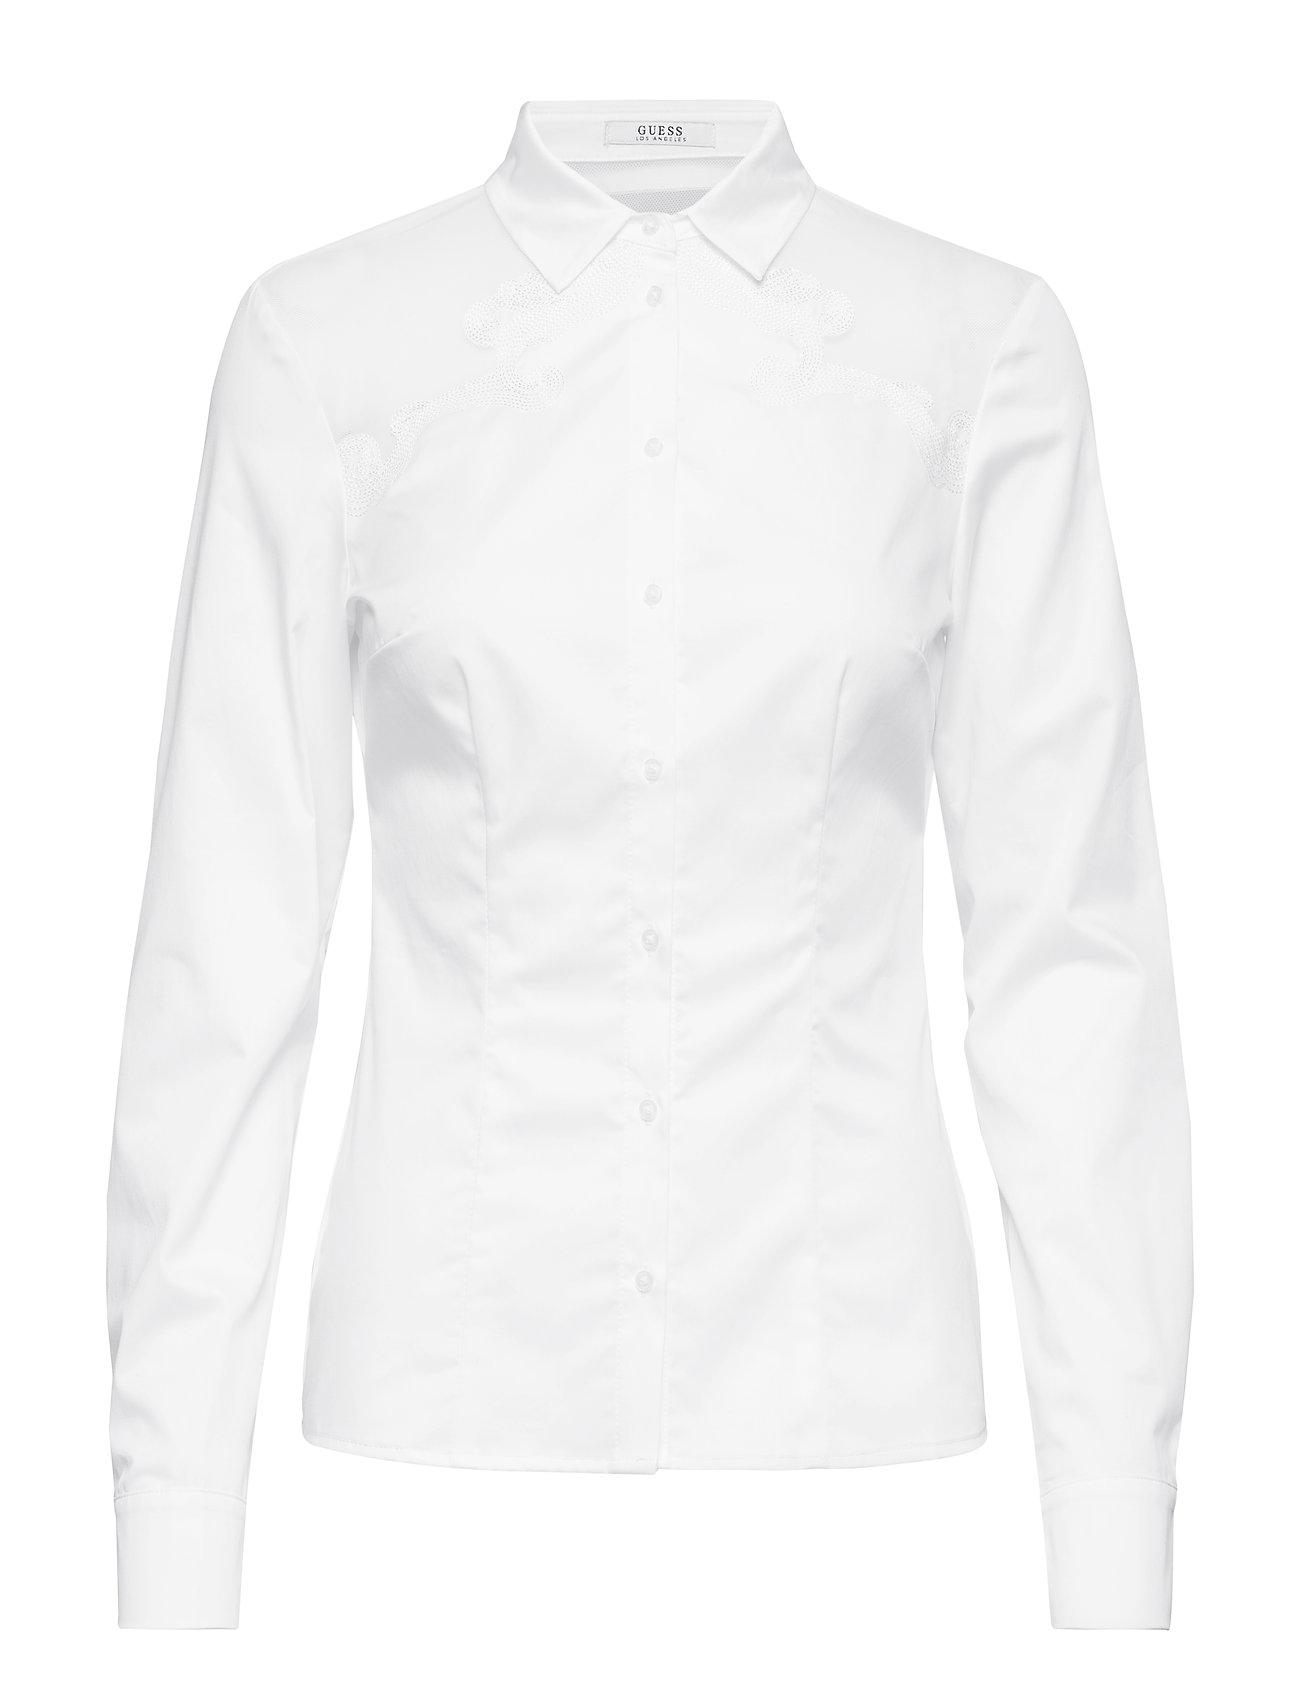 GUESS Jeans LS ROSALIA SHIRT - TRUE WHITE A000